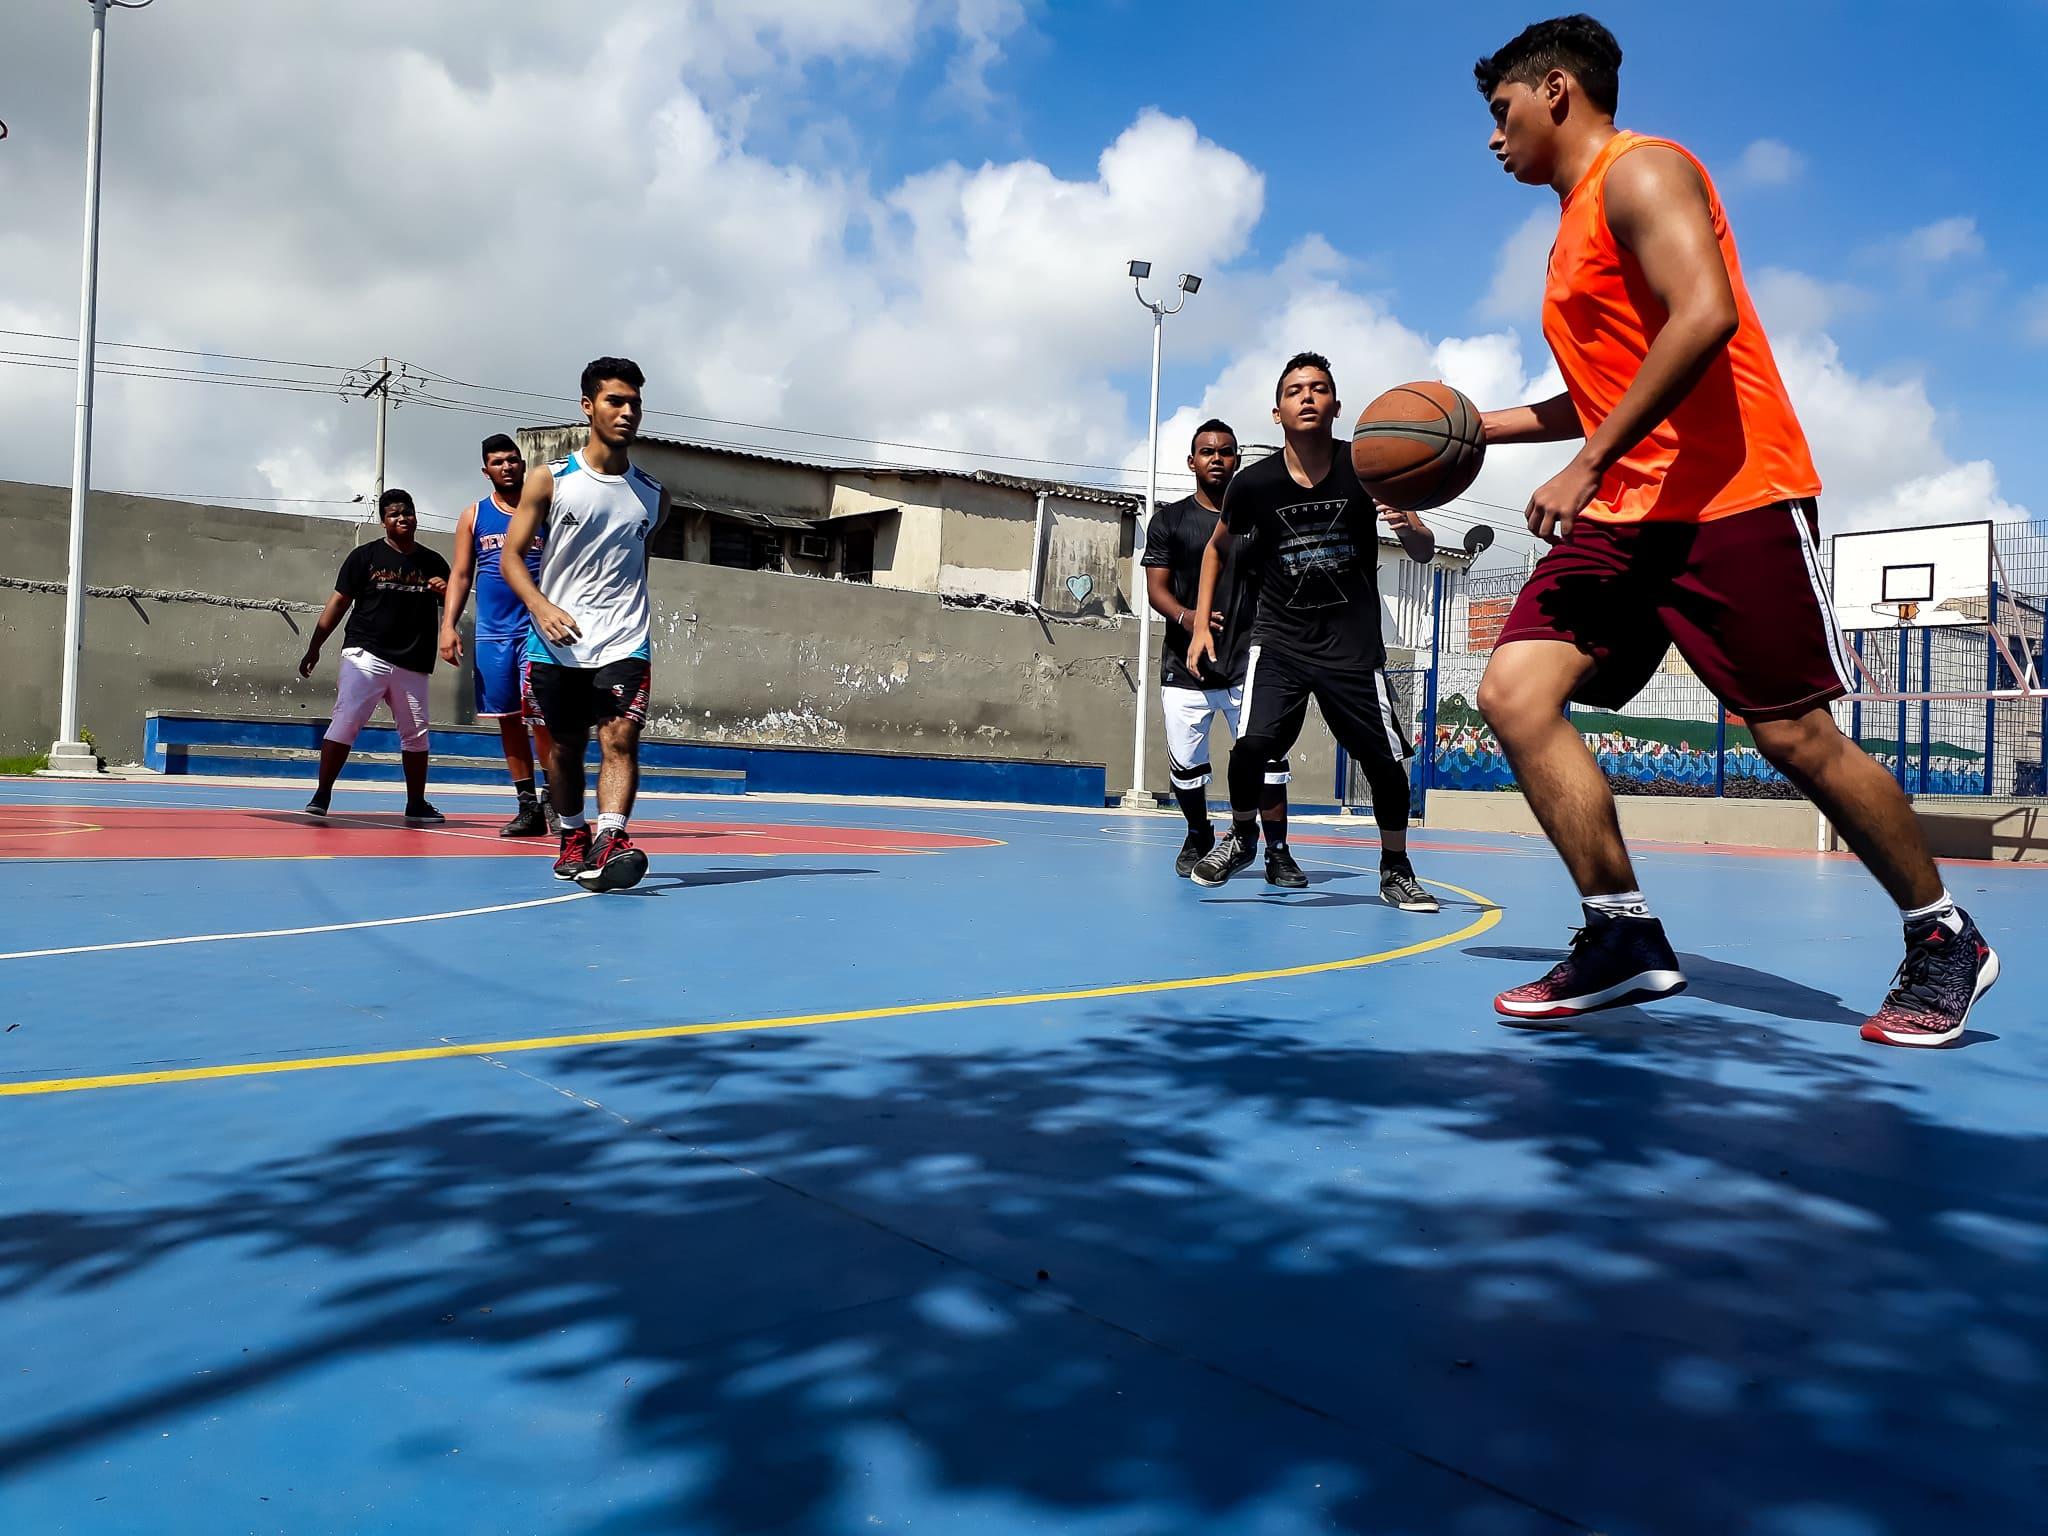 baloncesto sept 2018 (2)